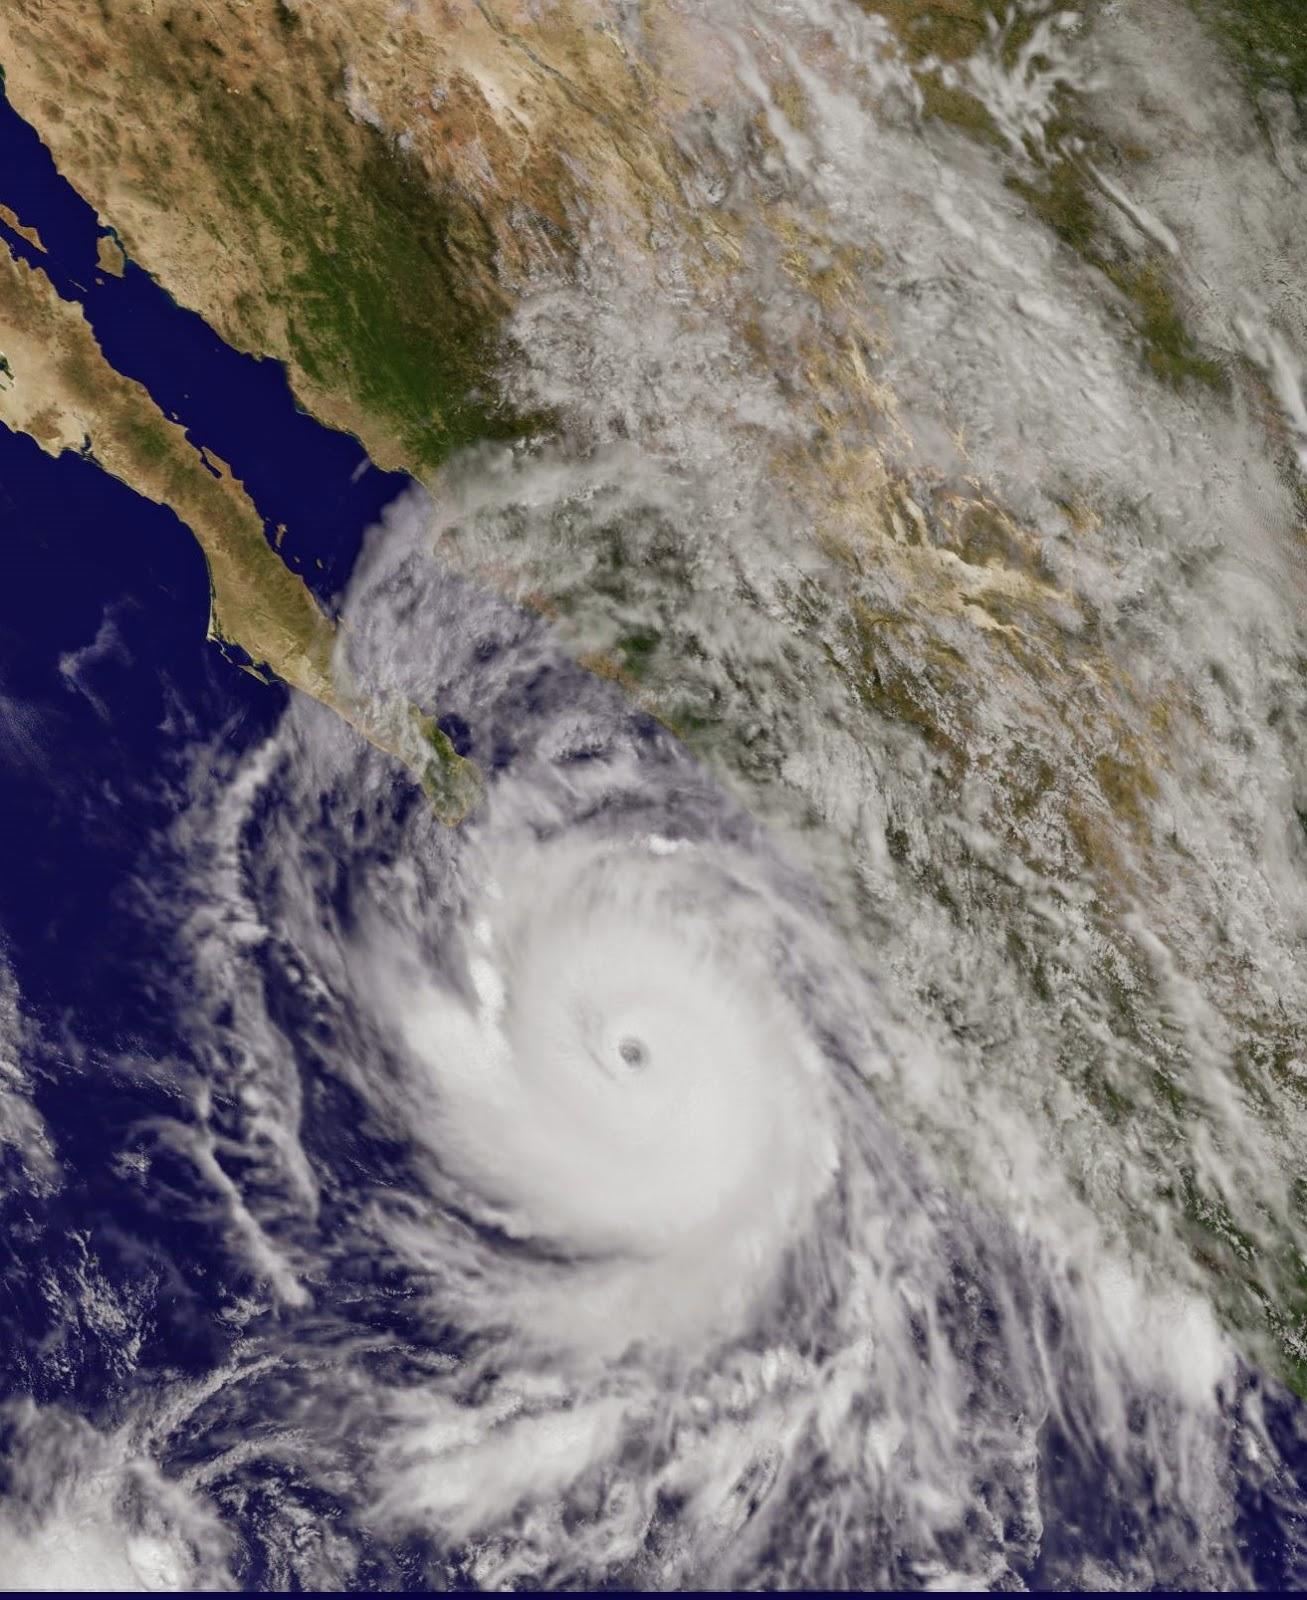 Hurrikan Odile, 14 September 2014, 2014, Acapulco, aktuell, Baja California, Mexiko, Odile, Pazifische Hurrikansaison, Puerto Vallarta, Satellitenbild Satellitenbilder, September, Vorhersage Forecast Prognose,